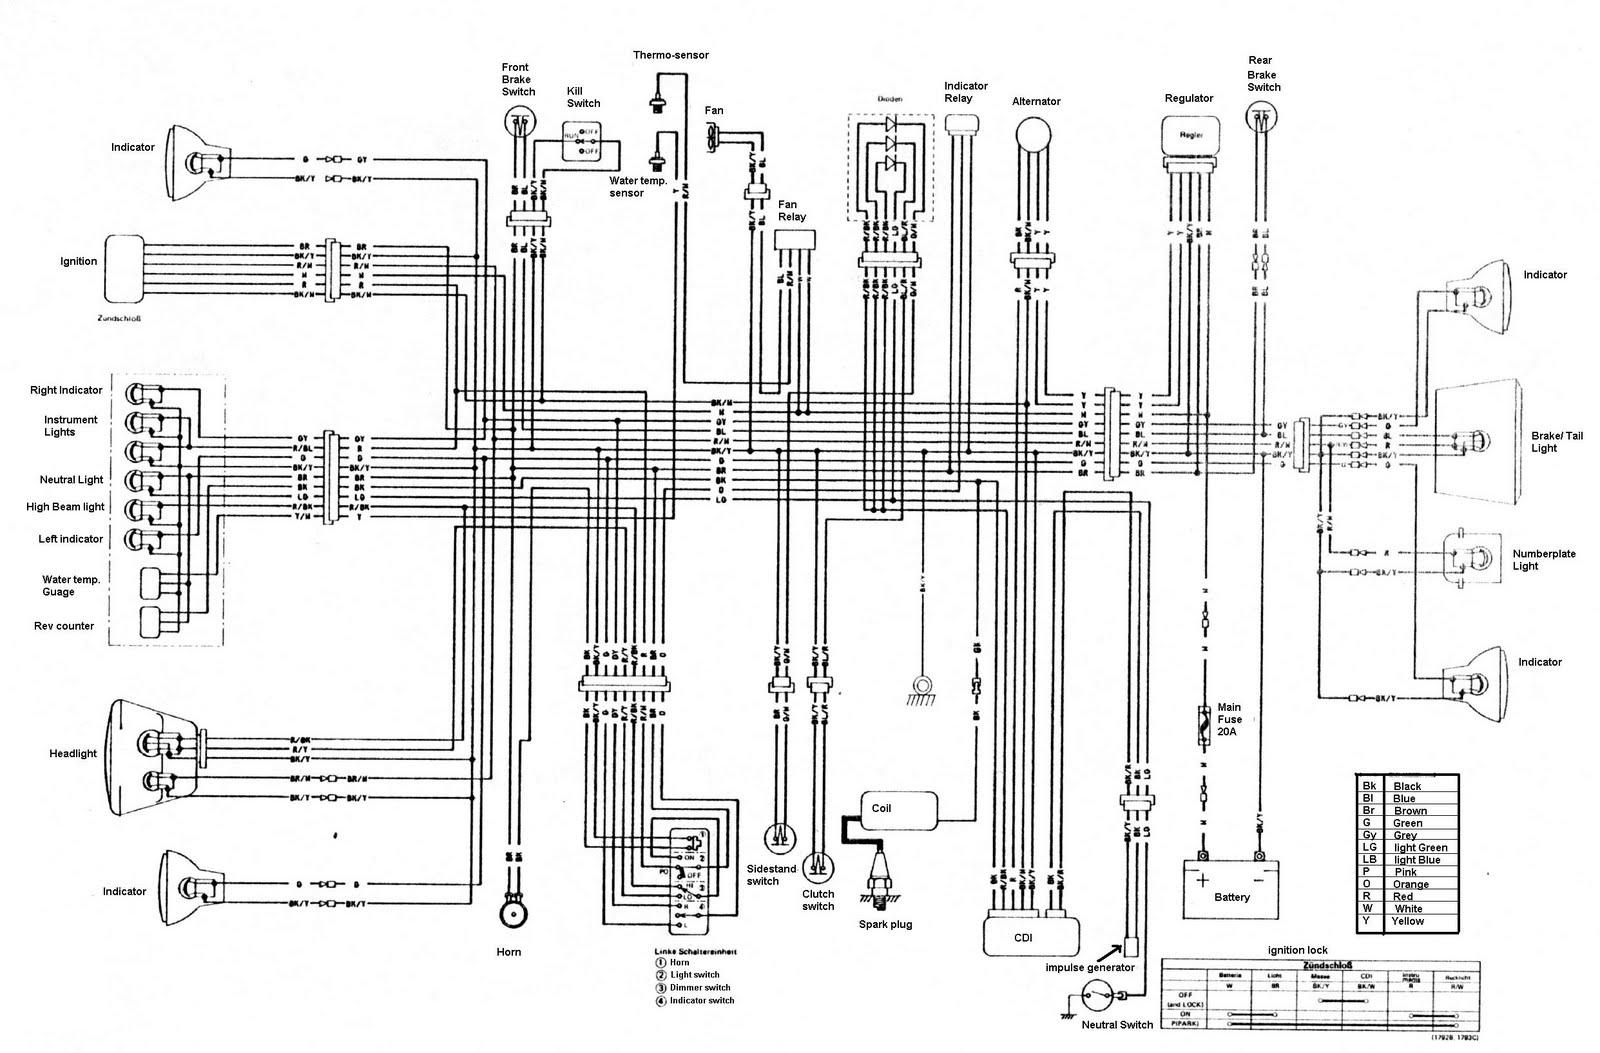 Diagram Kawasaki 185 Wiring Diagram Full Version Hd